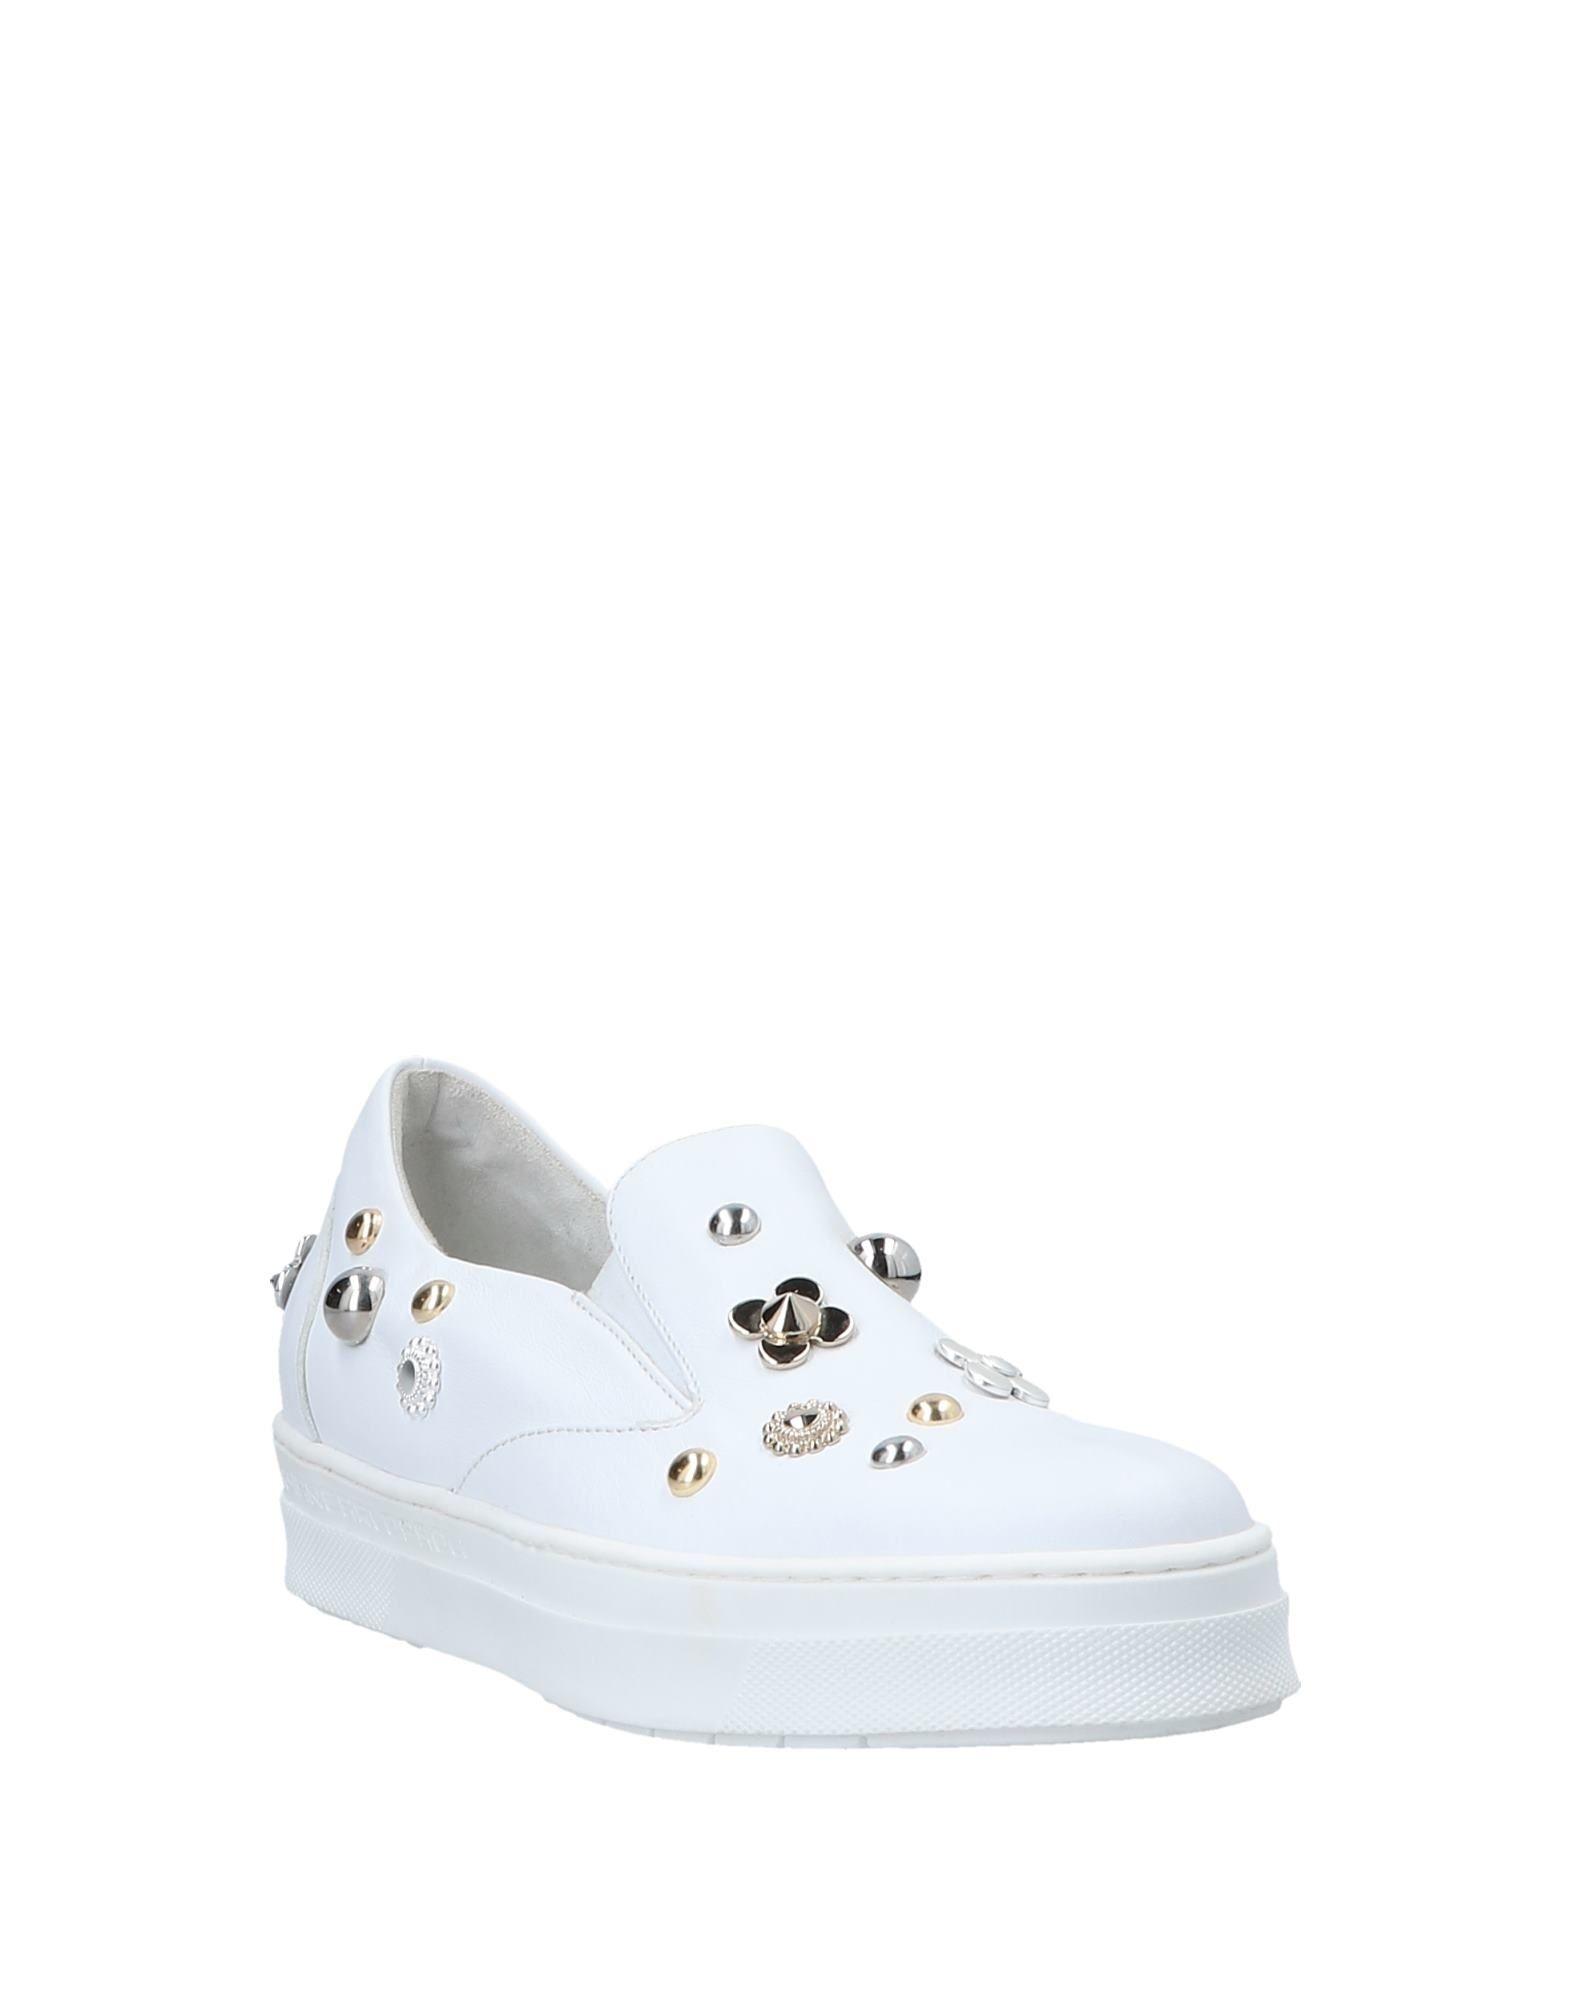 Stilvolle billige Schuhe Giancarlo Paoli Paoli Paoli Sneakers Damen  11235818OW 9b3c0b